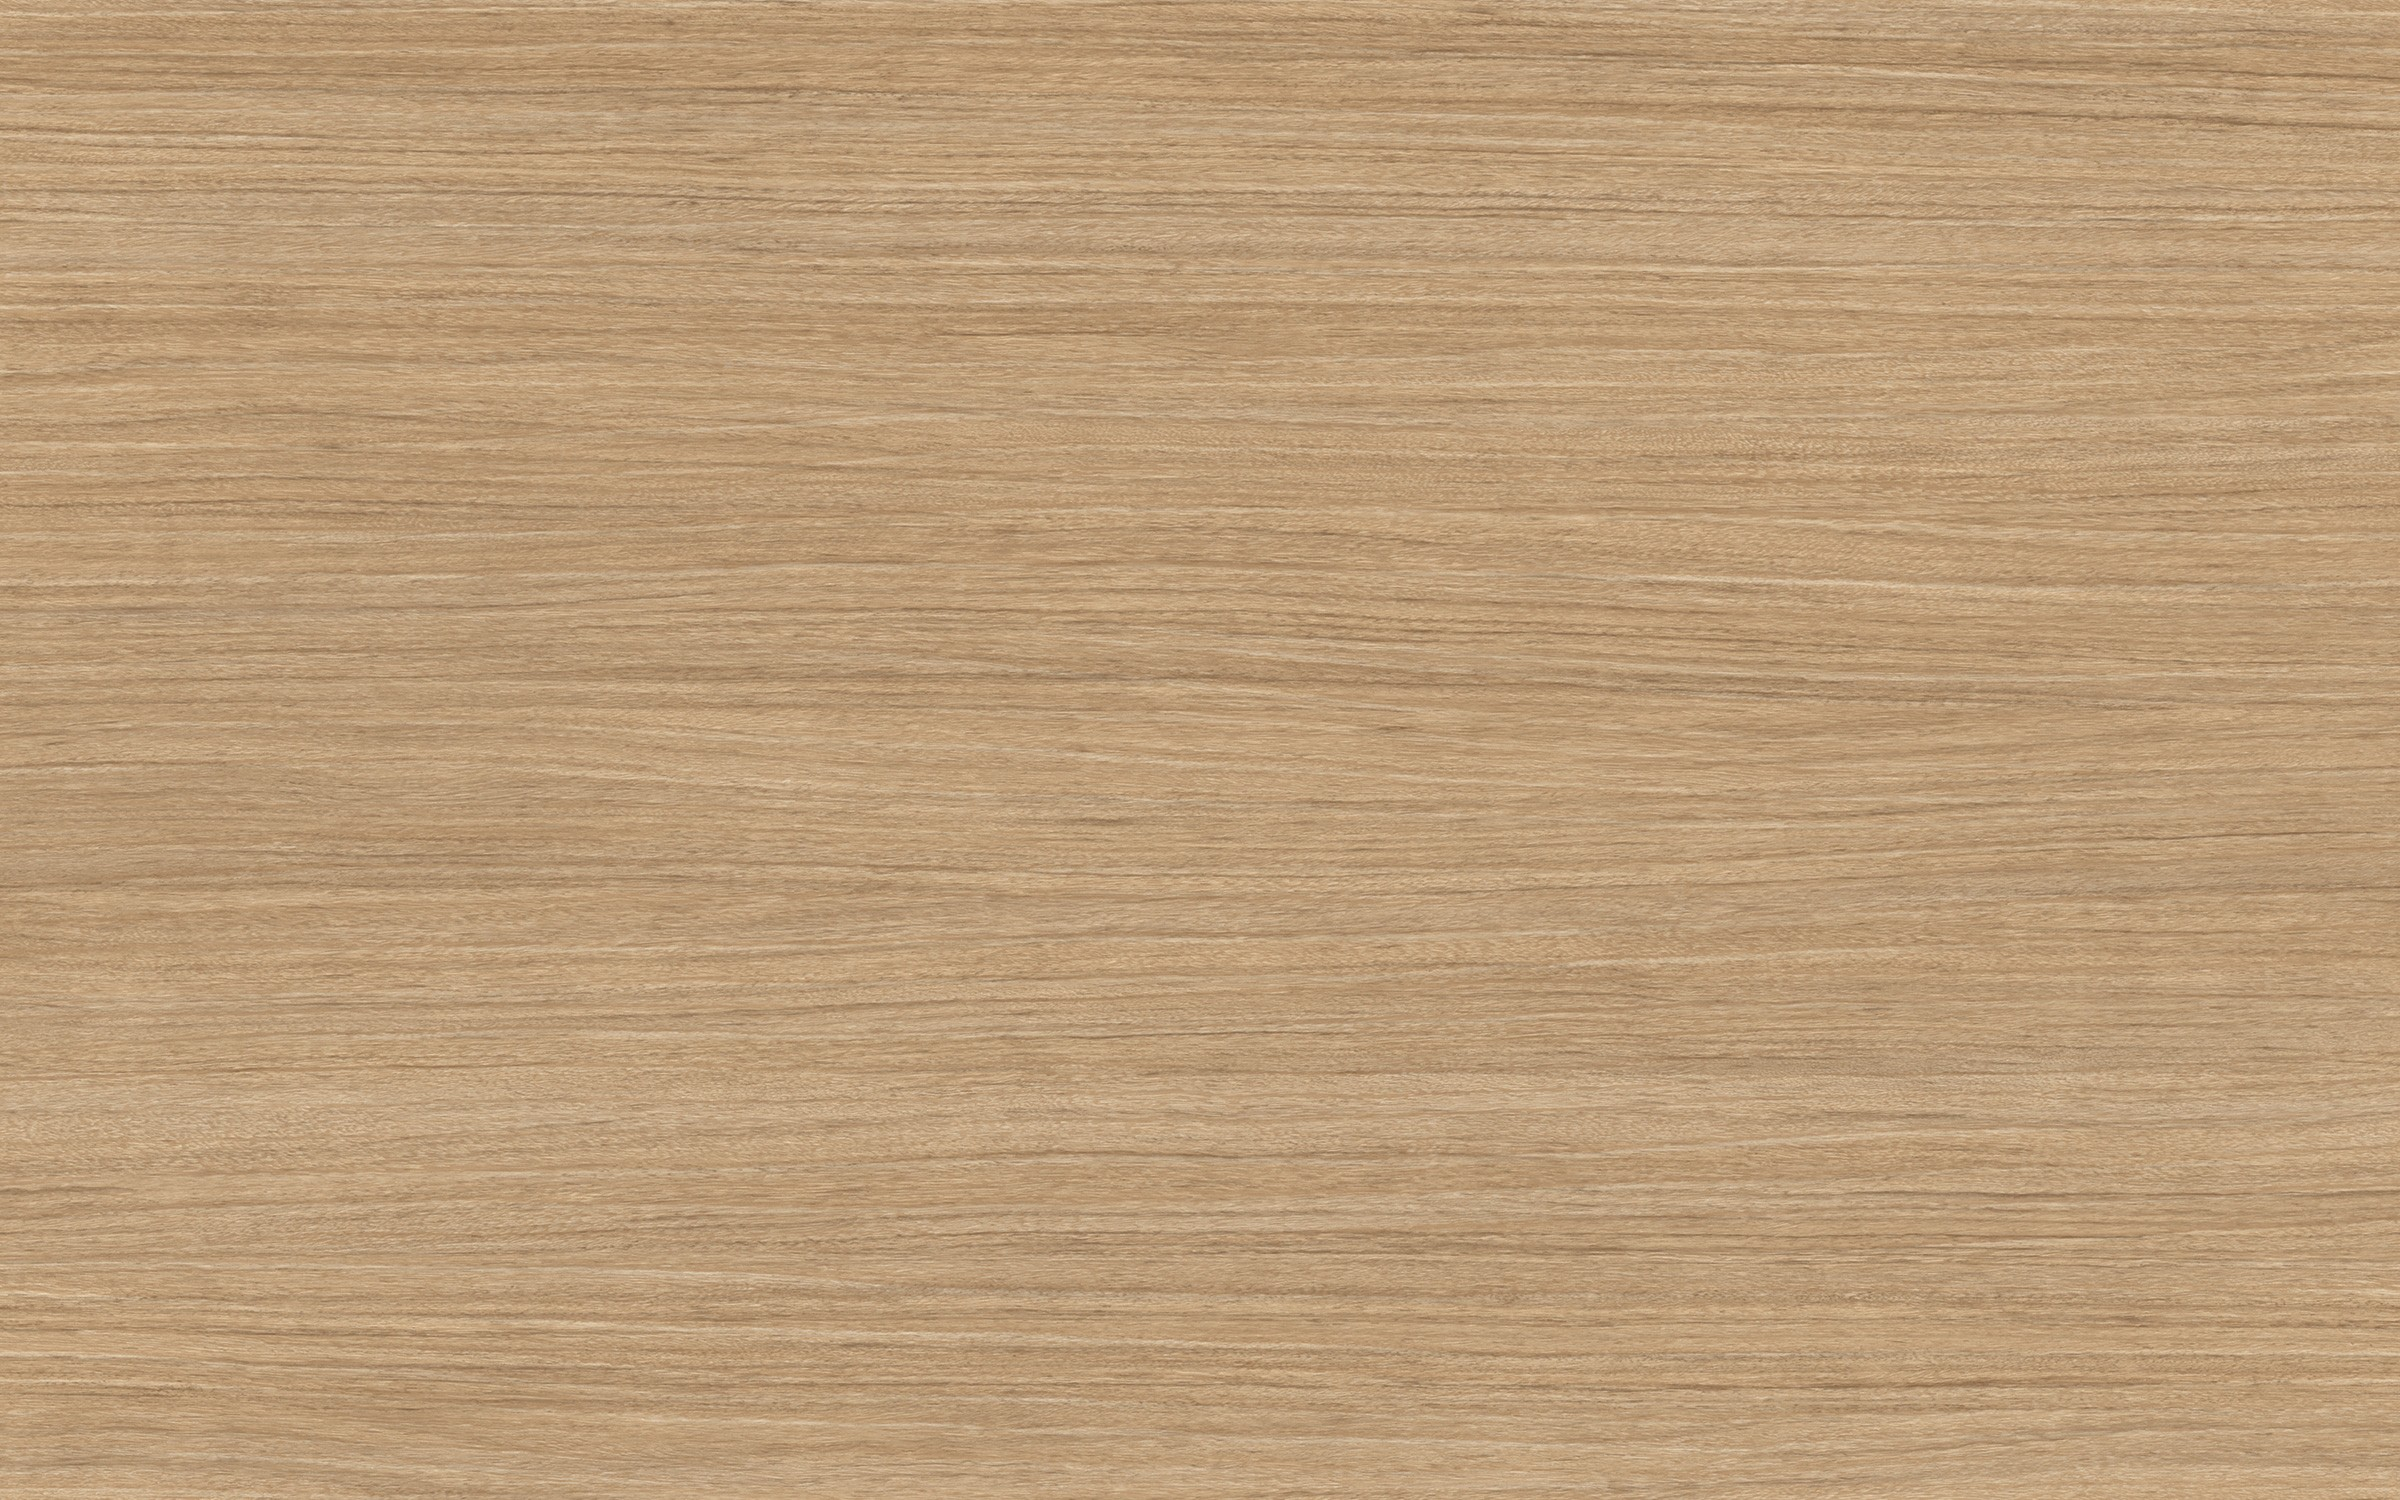 7981 Landmark Wood Laminate Countertops